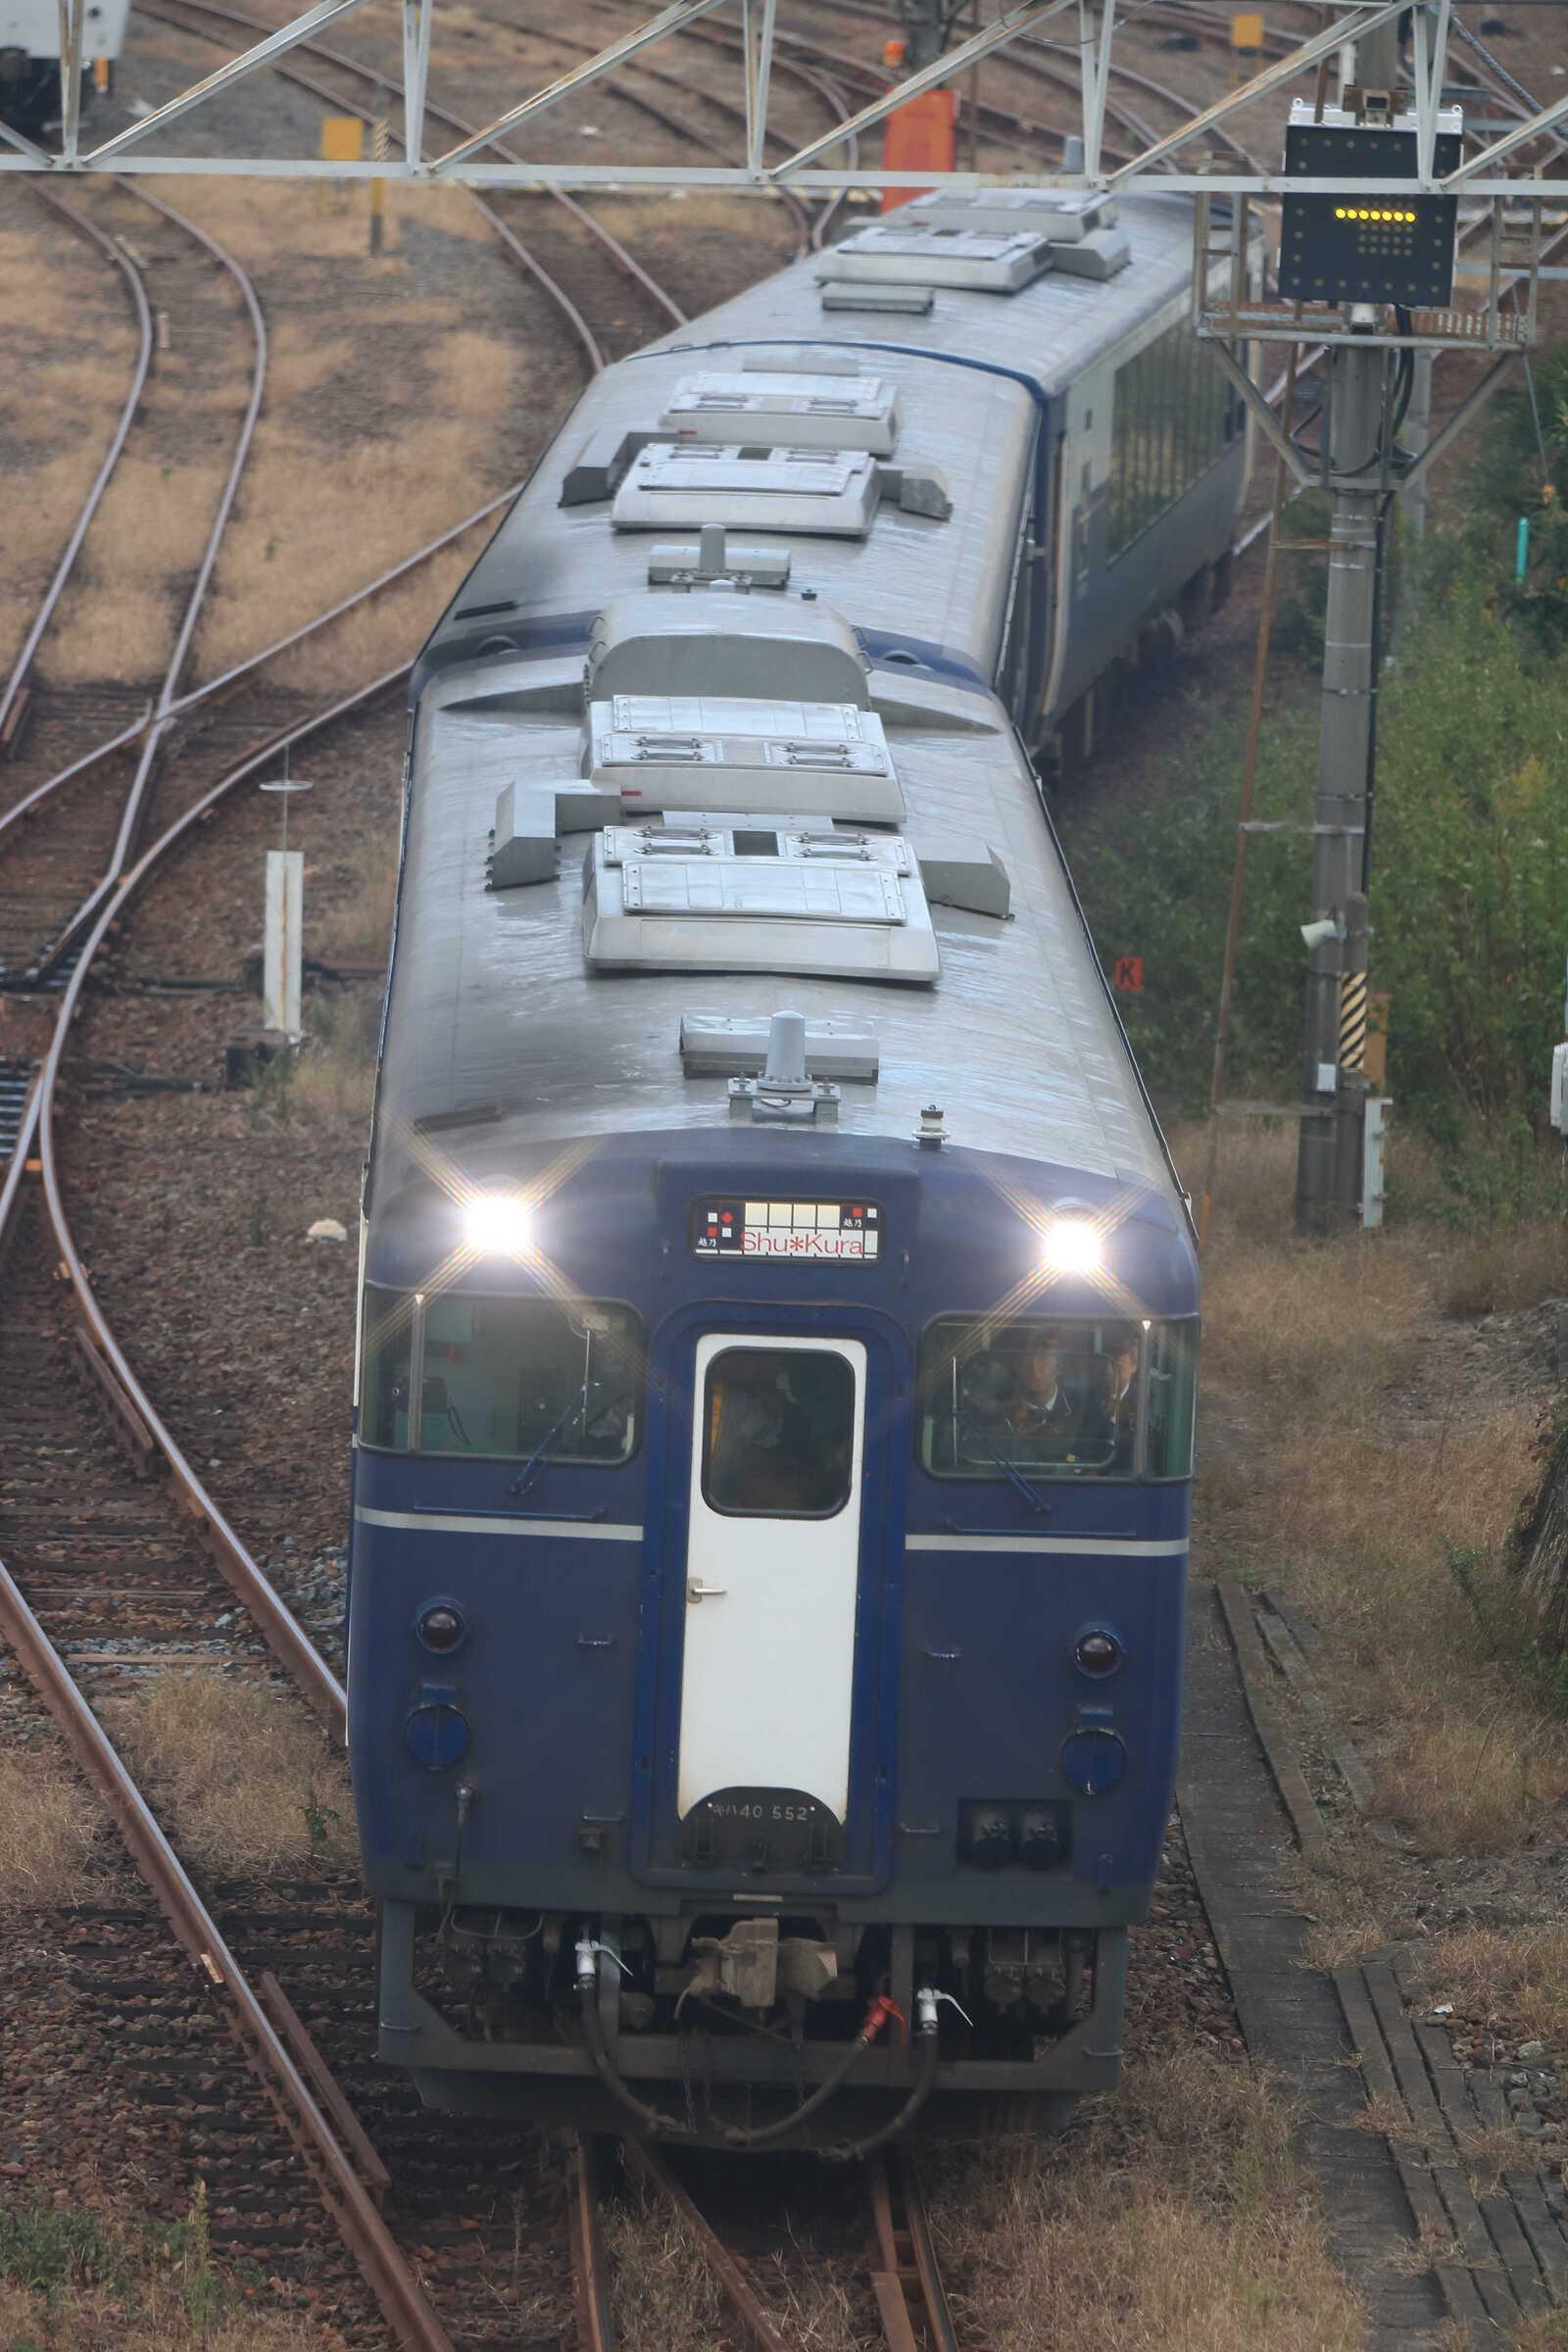 キハ40-552(新ニツ)+キハ48-1542(新ニツ)+キハ48-558(新ニツ)